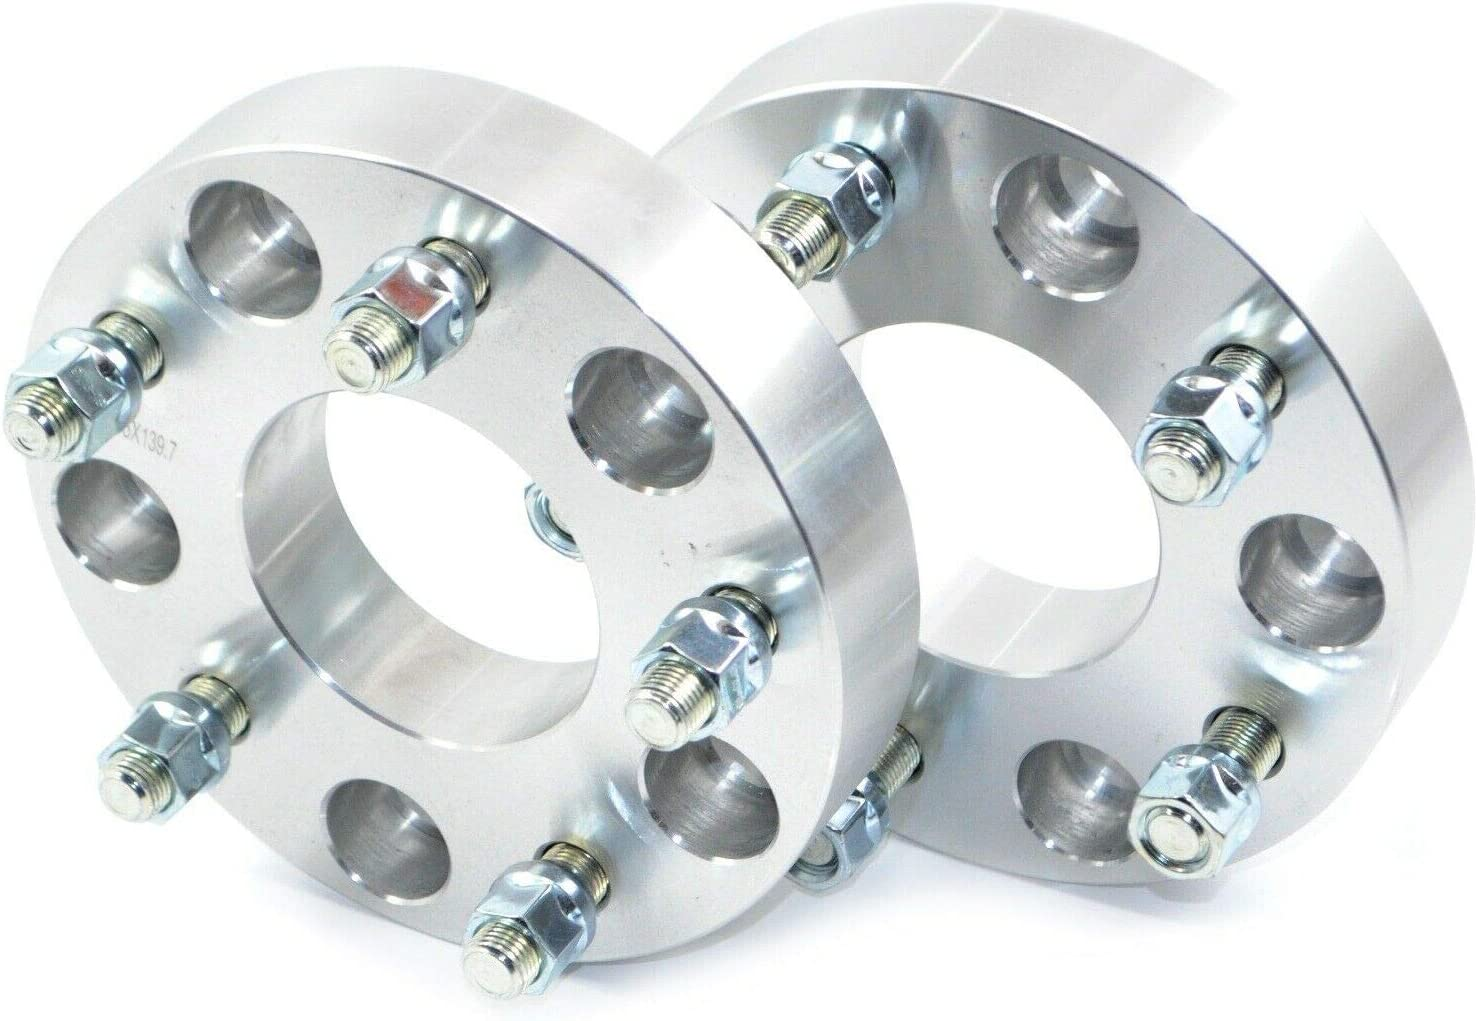 5 x 139.7 9//16-18 UNF Wheel Spacer Lot de 2 /élargisseurs de voie en aluminium 34 mm RAM 1500 2002